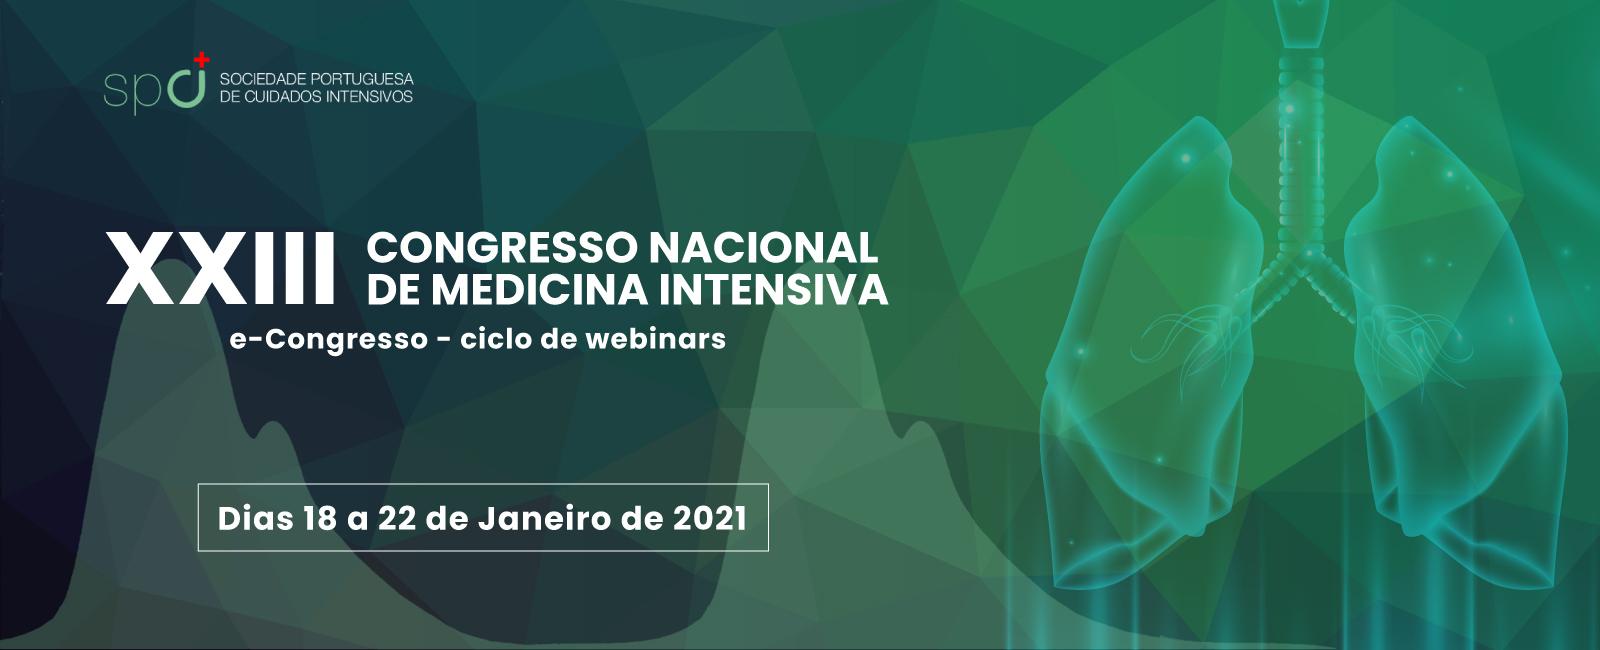 XXIII Congresso Nacional de Medicina Intensiva | e-congresso - ciclo de webinars